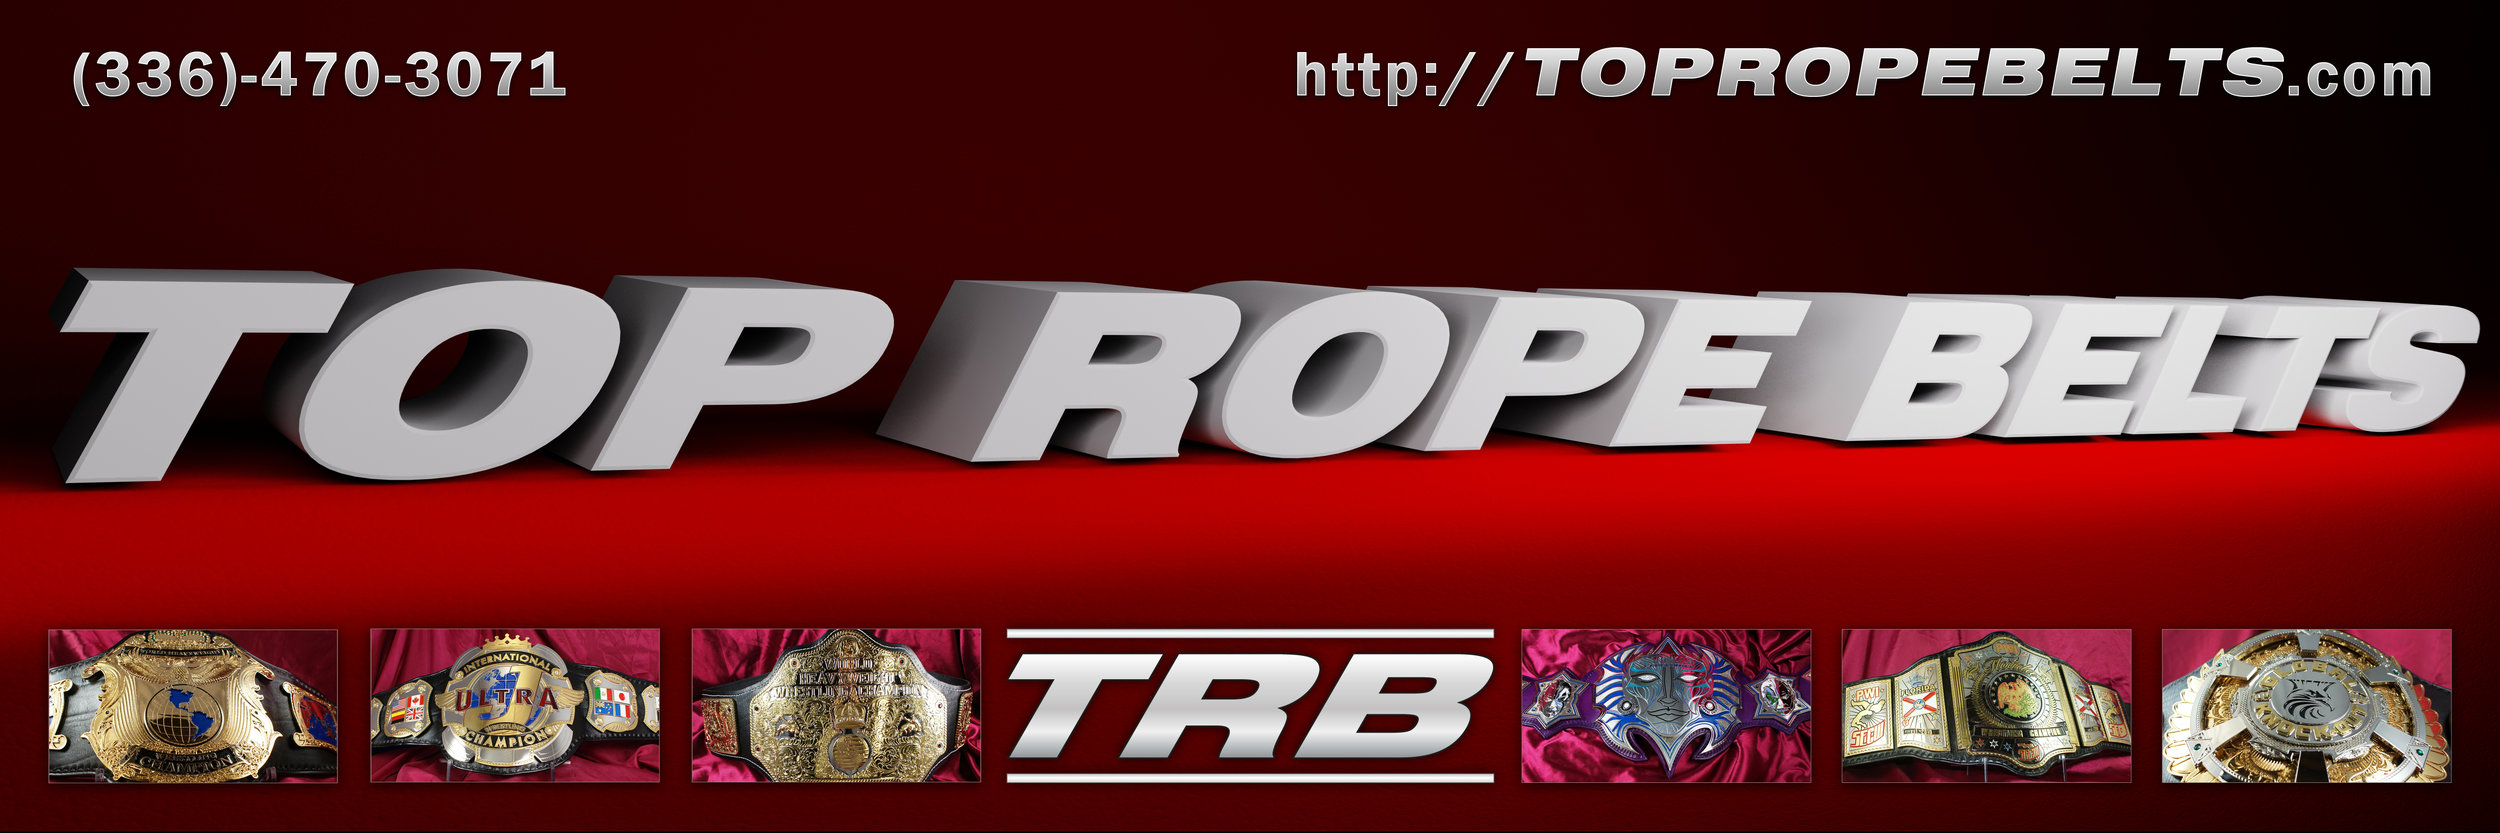 trb_ring_banner-6.jpg